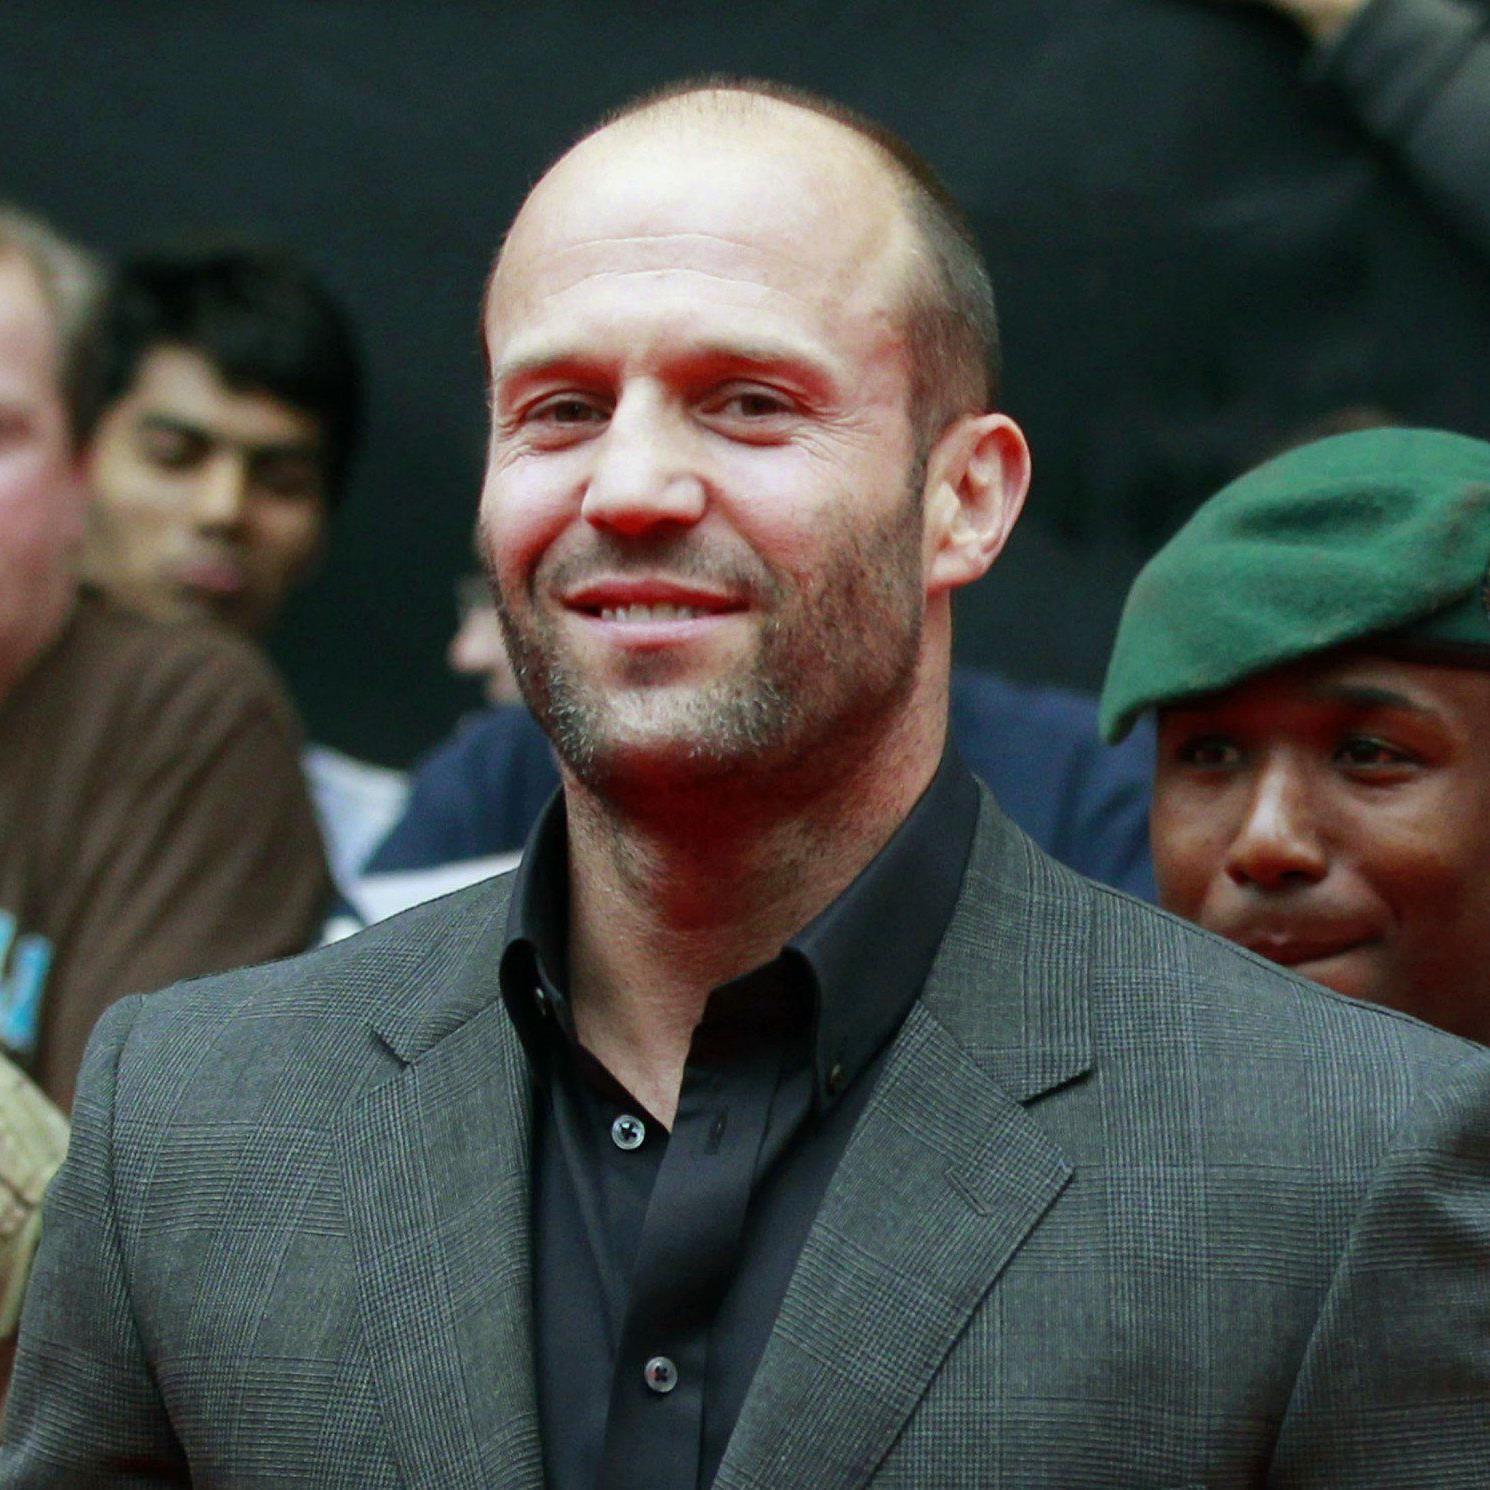 Jason Statham ist bei Dreharbeiten in Bulgarien beinahe ertrunken.